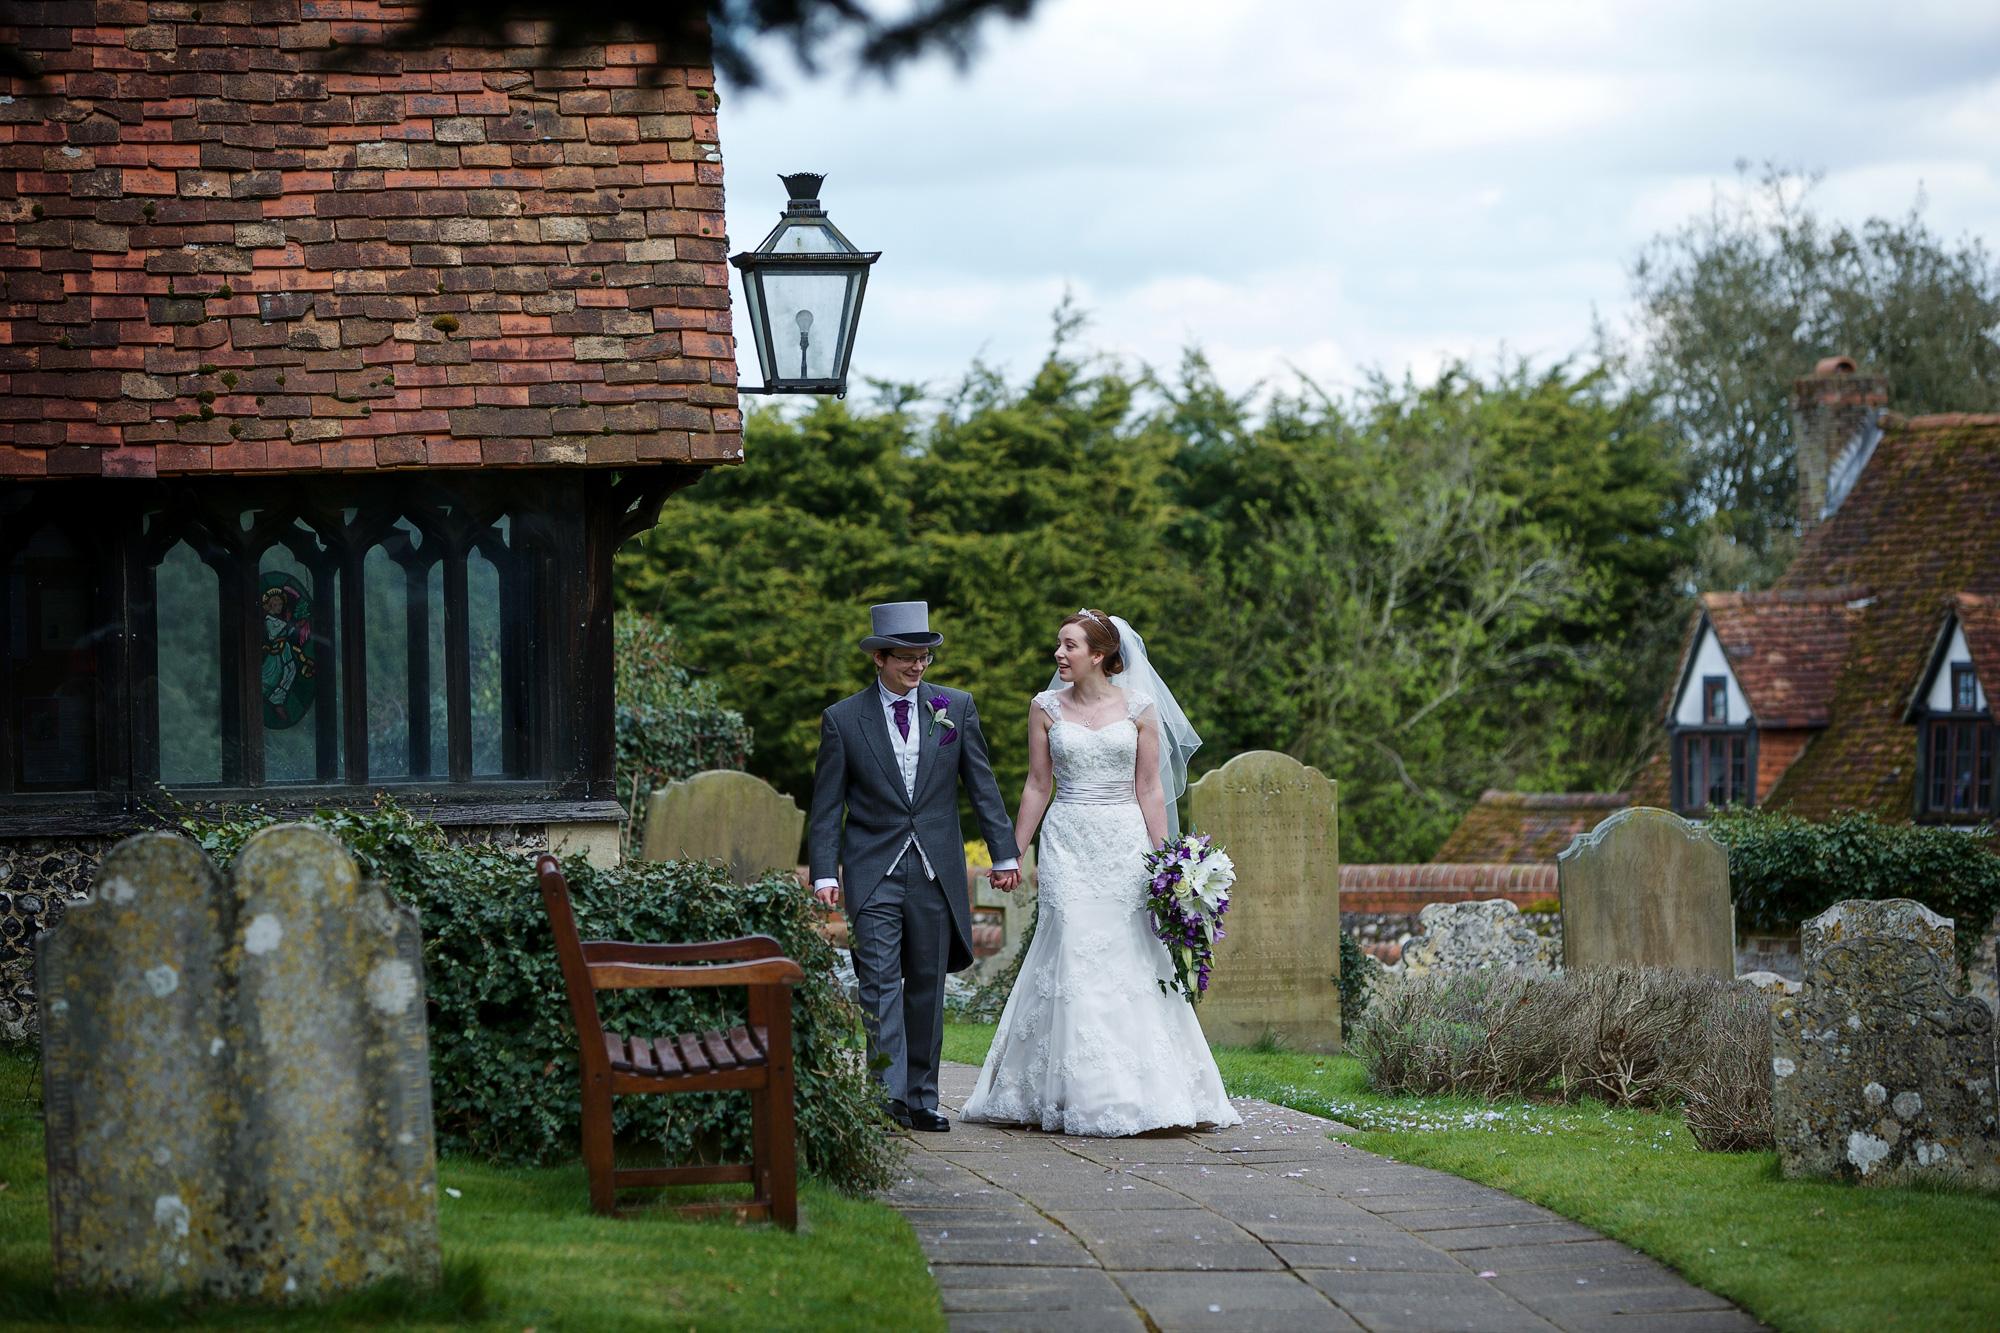 Adam_Hillier_Wedding_Photographer_Newbury_Berkshire_2 (7).jpg